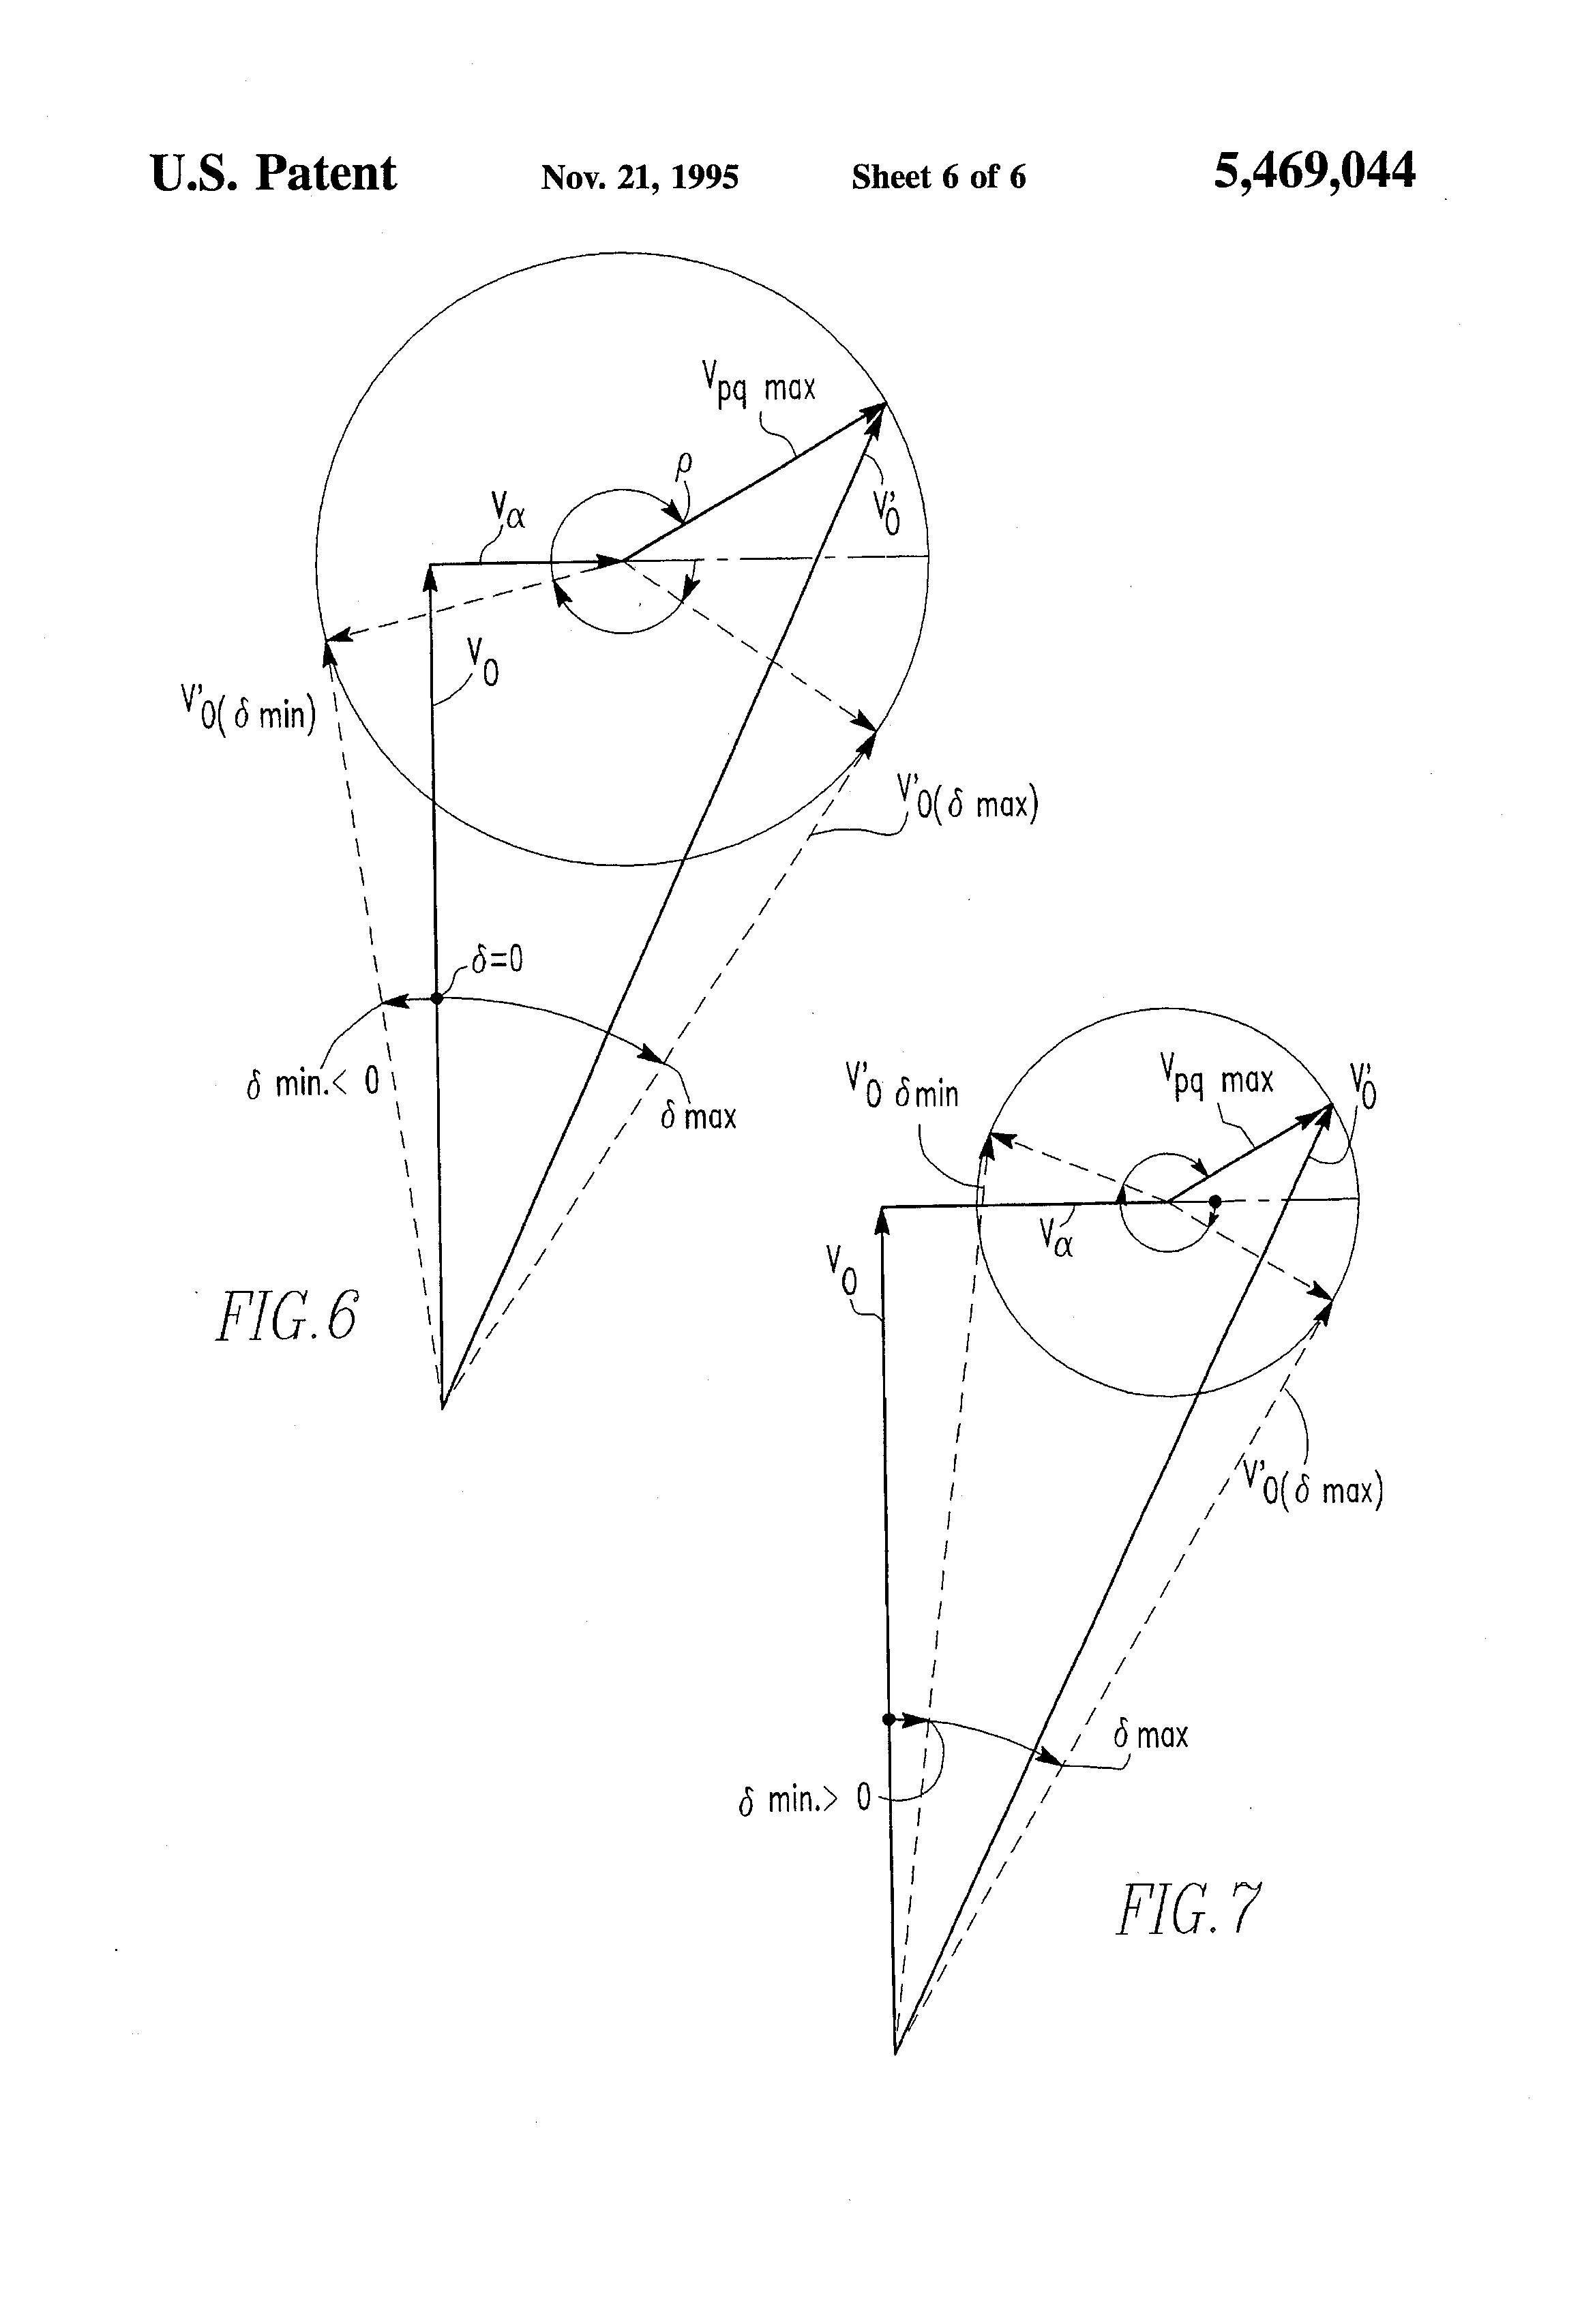 Draw Phasor Diagram Online Patent Transmission Line Power Flow Controller